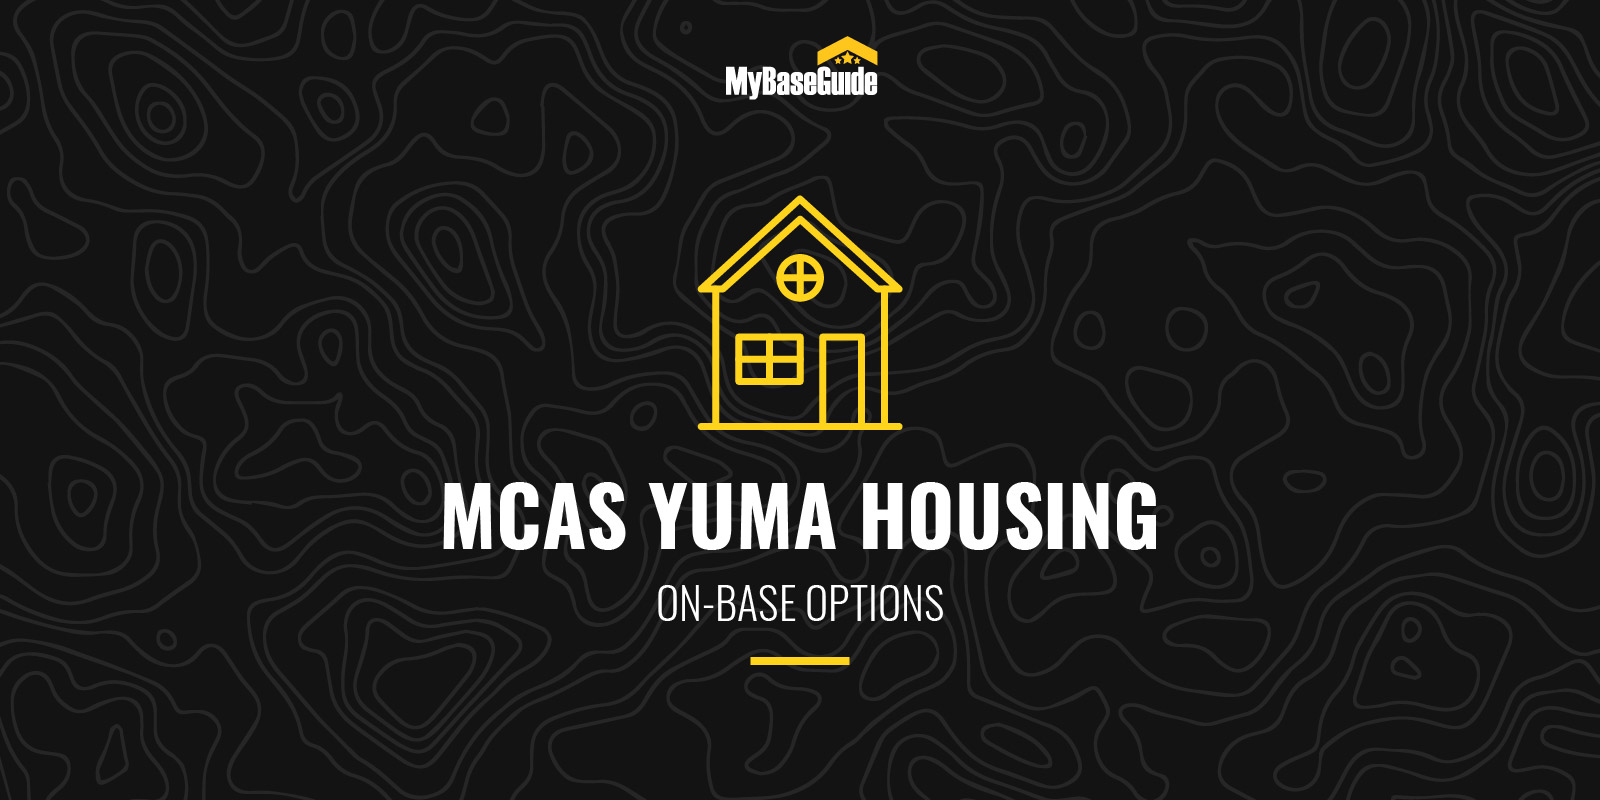 MCAS Yuma Housing: On-Base Options